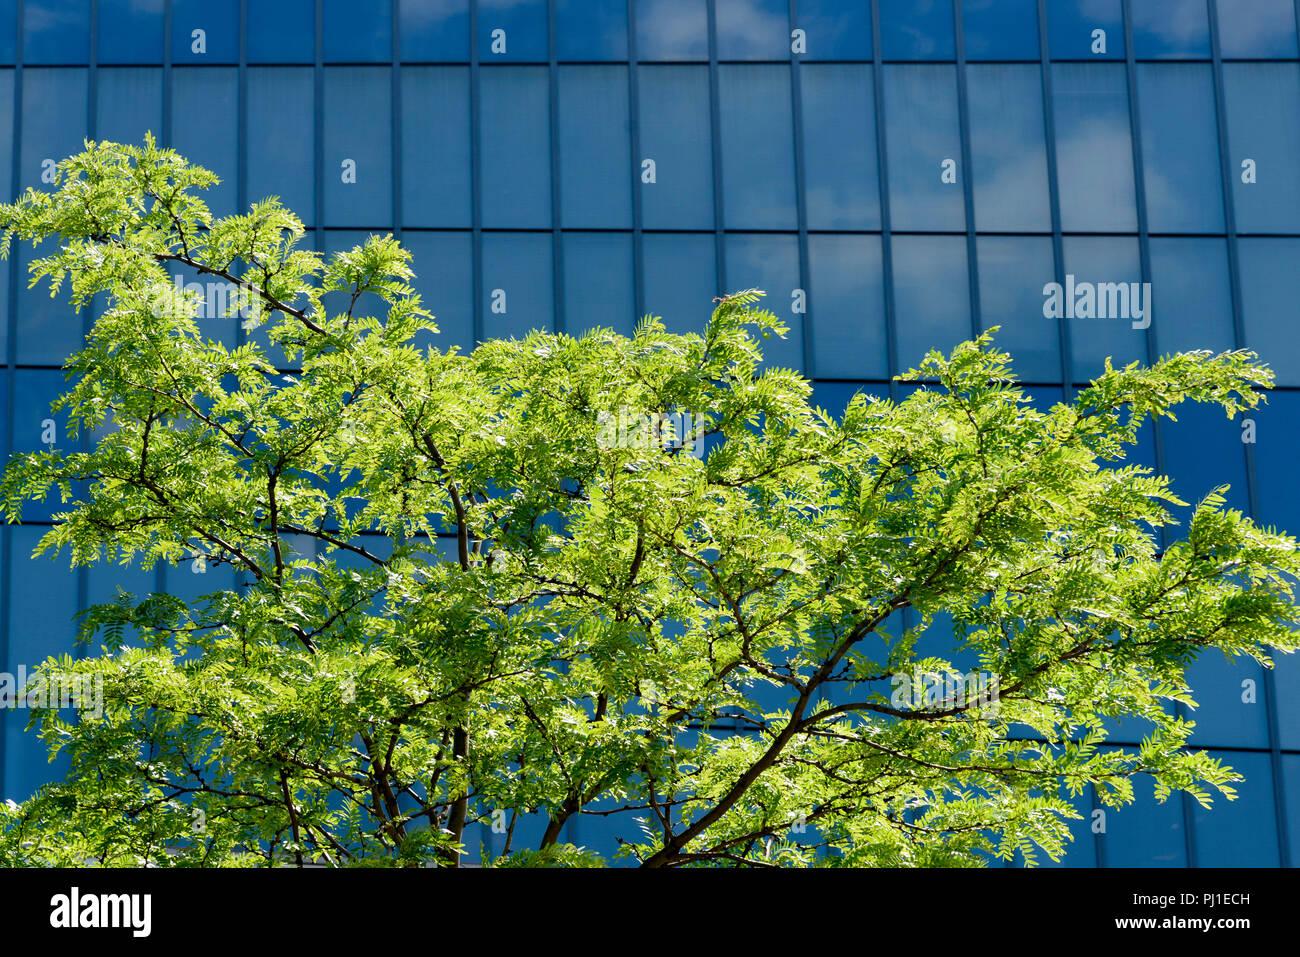 05-2017 New York, USA. Photo: © Simon Grosset - Stock Image